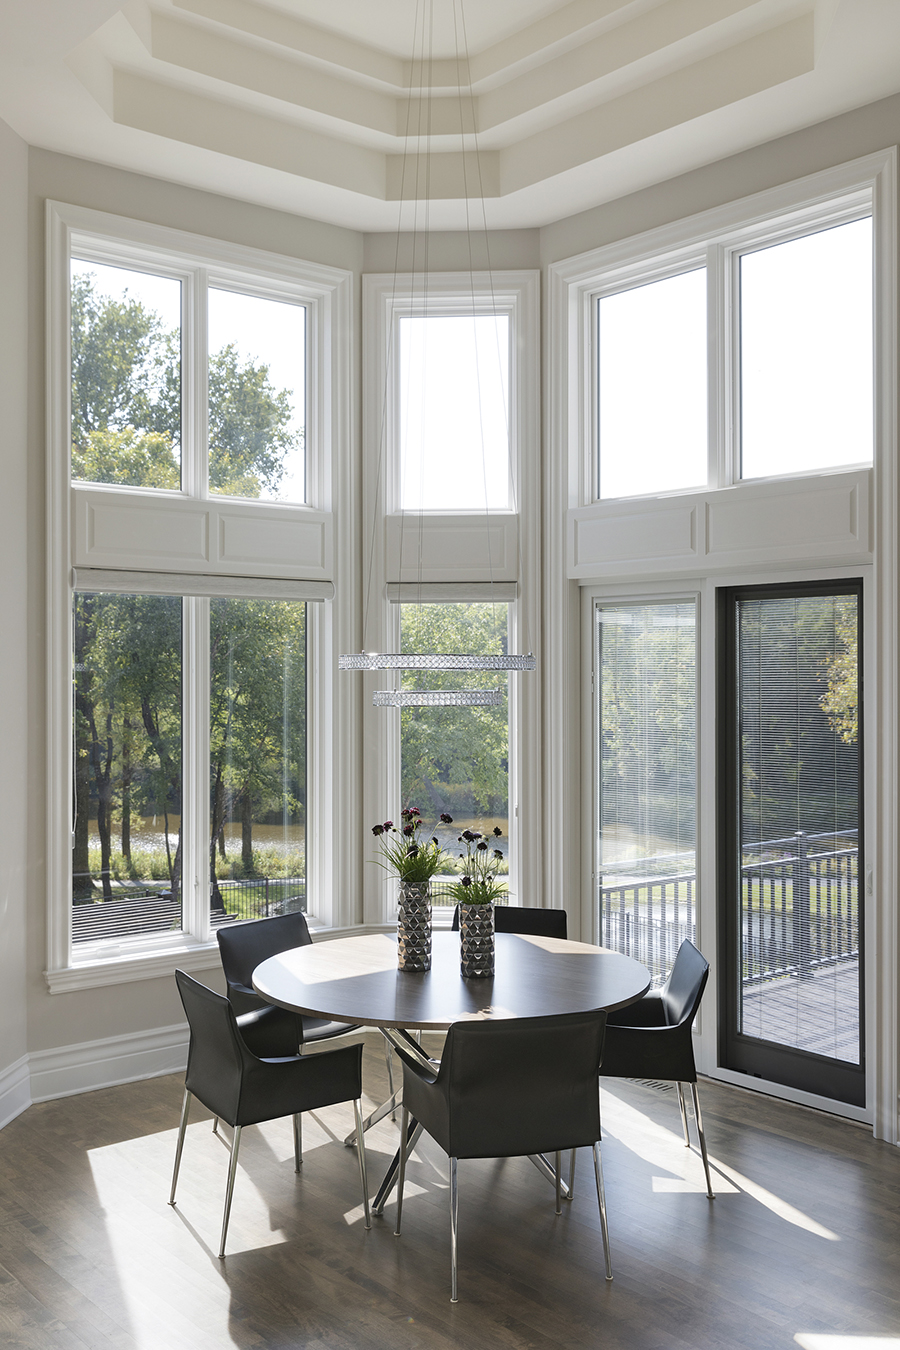 Belle Kitchen Interior Design Designer Luxury Minnesota MN Mpls Minneapolis St Paul Twin Cities12.jpg